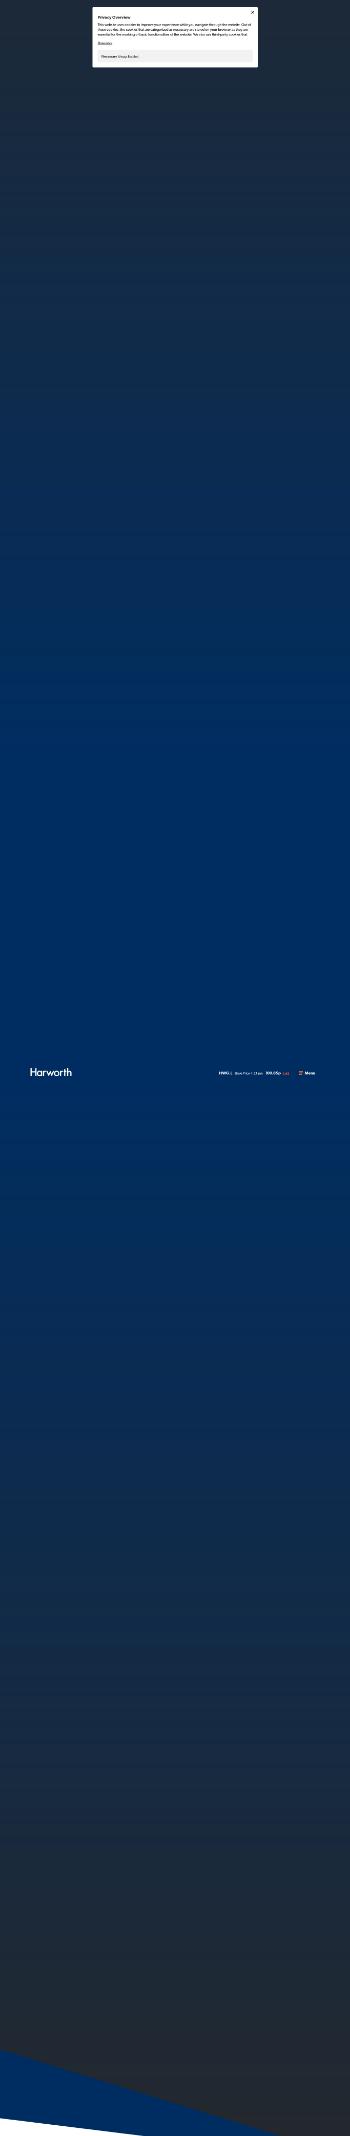 Harworth Group plc Website Screenshot